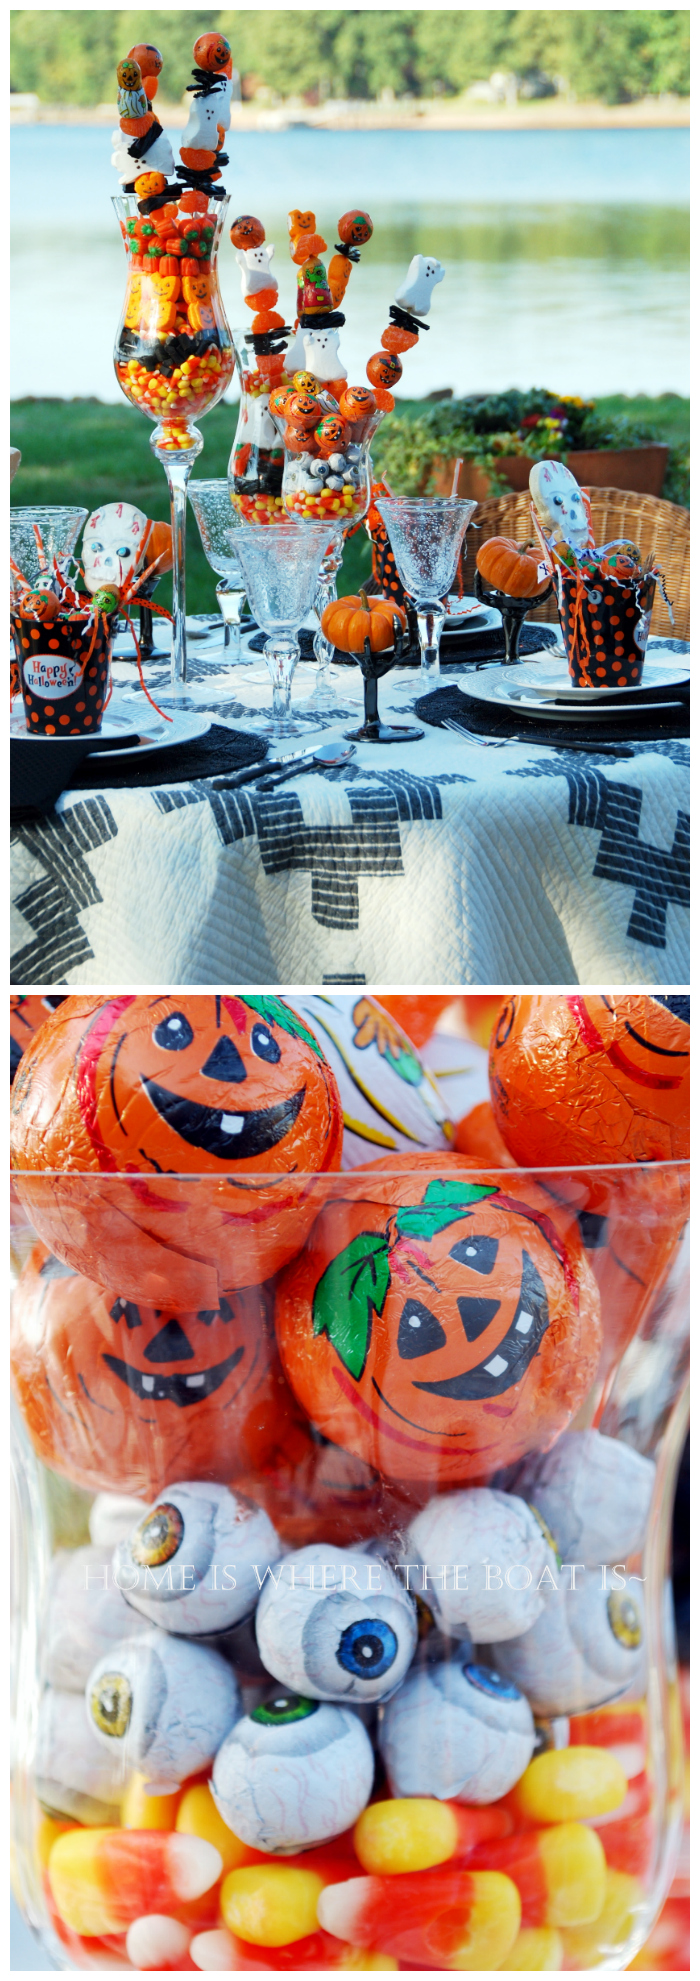 Halloween Treats Tablescape | ©homeiswheretheboatis.net #Halloween #tablescape #alfresco #lake